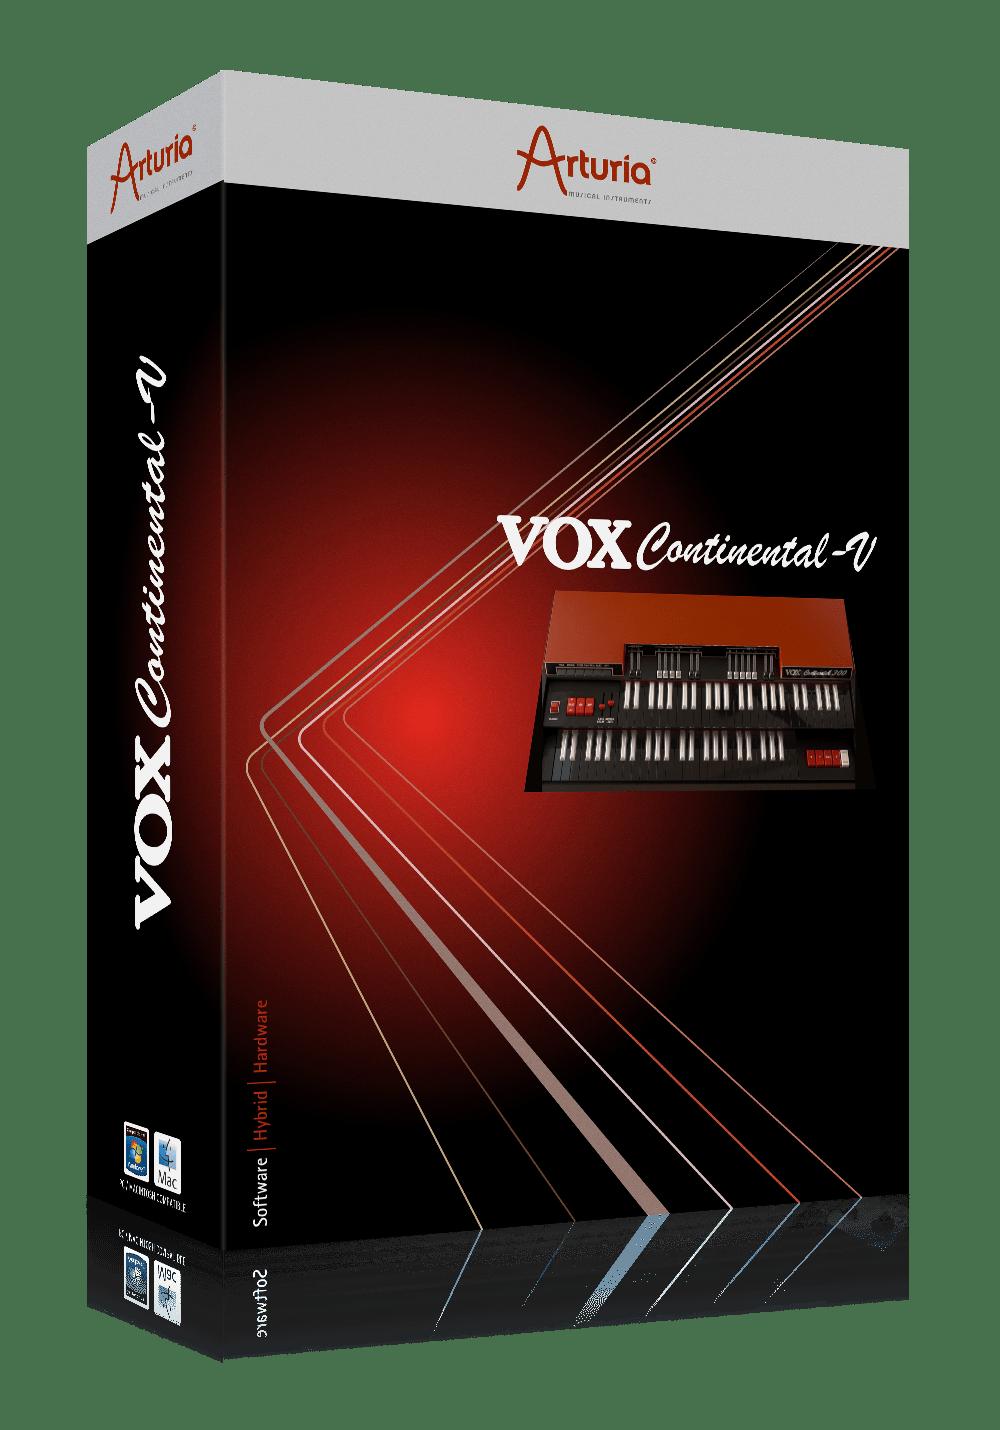 VOX Continental-V